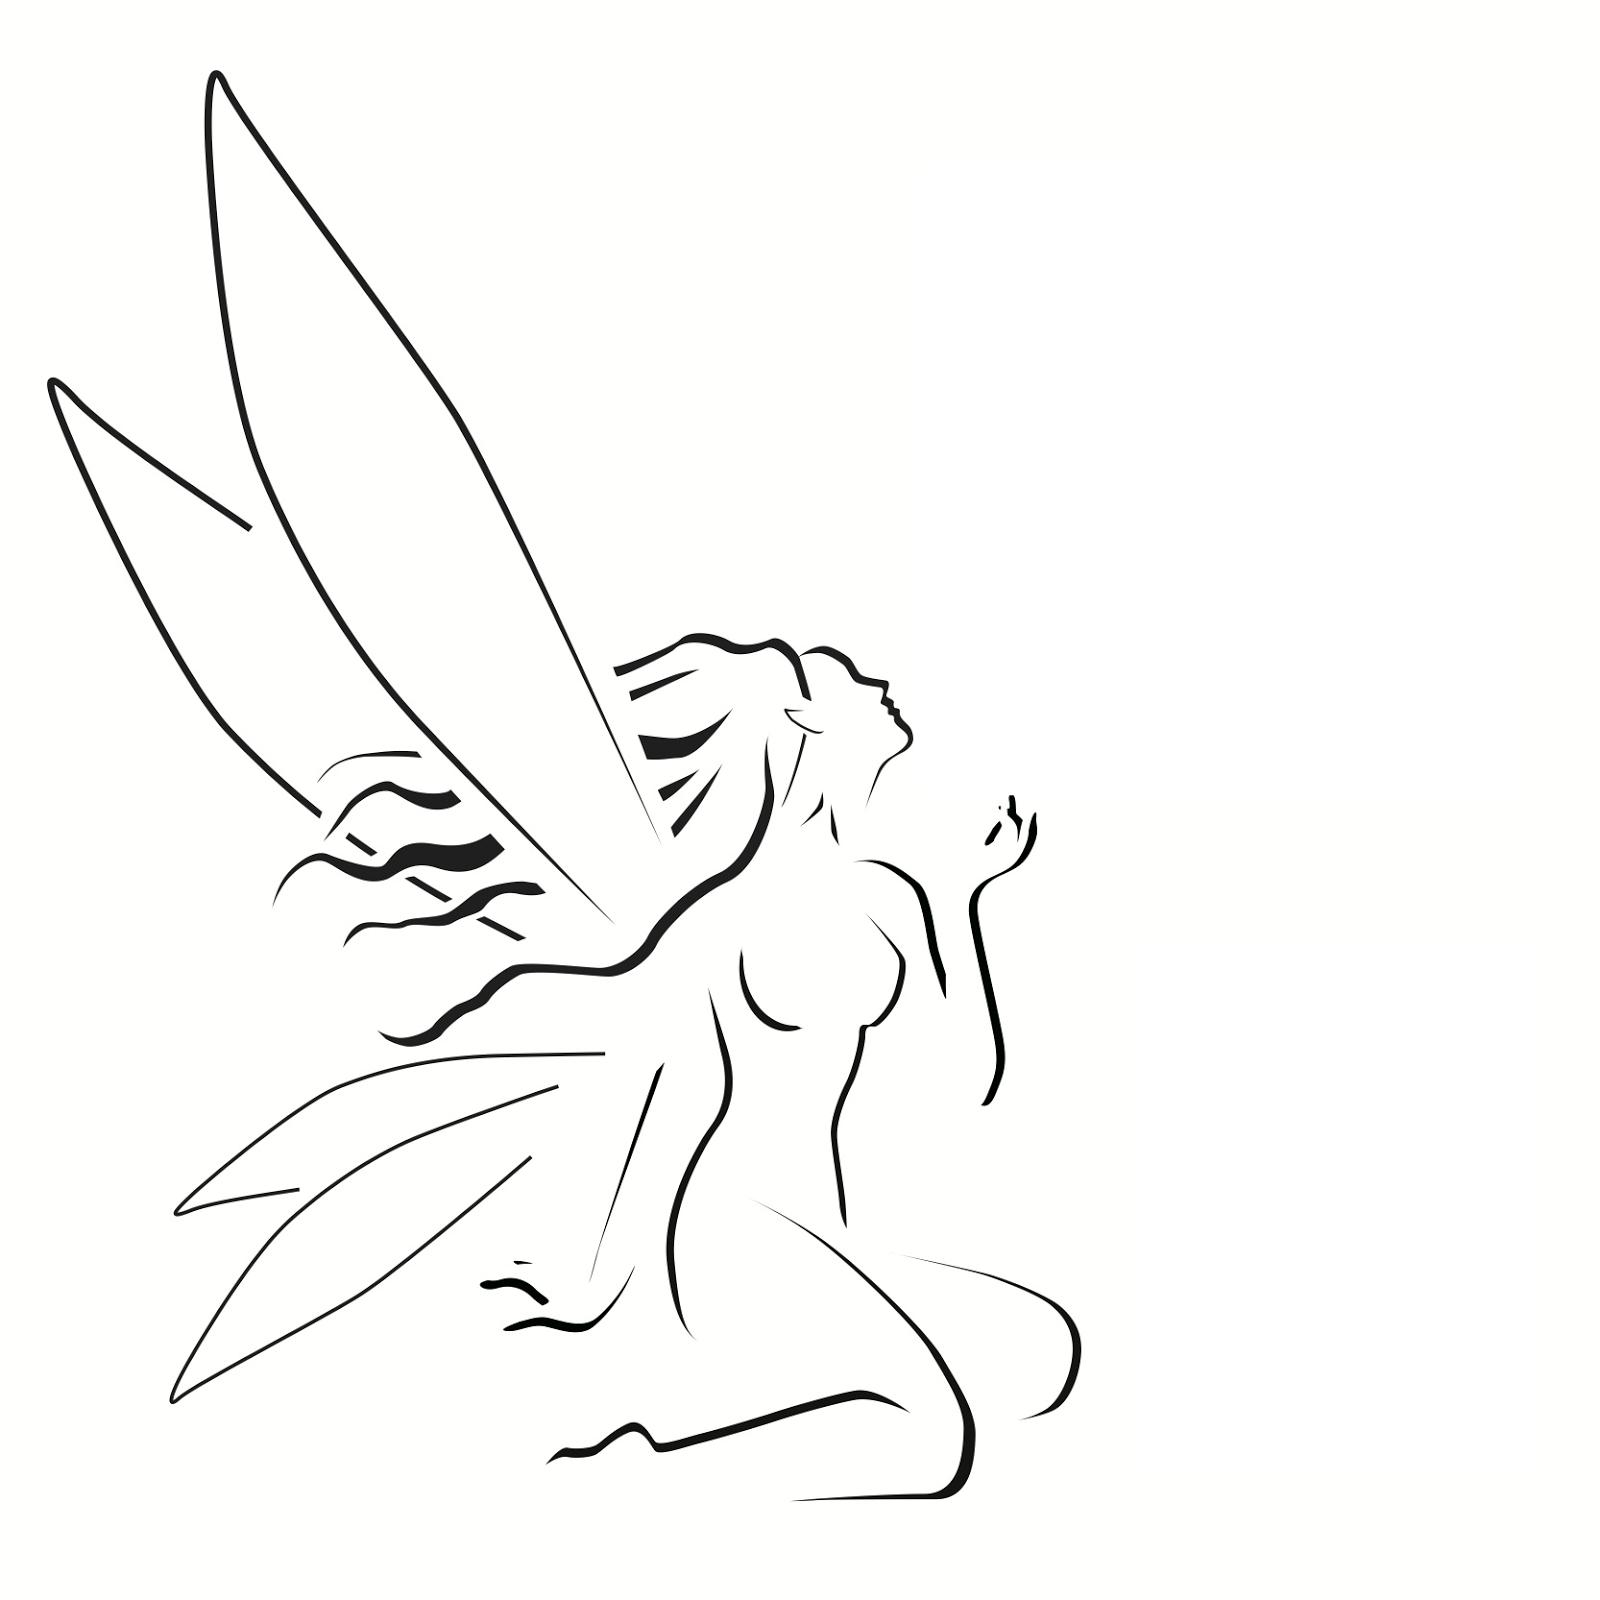 Fairy drawings in pencil pencil sketch drawing